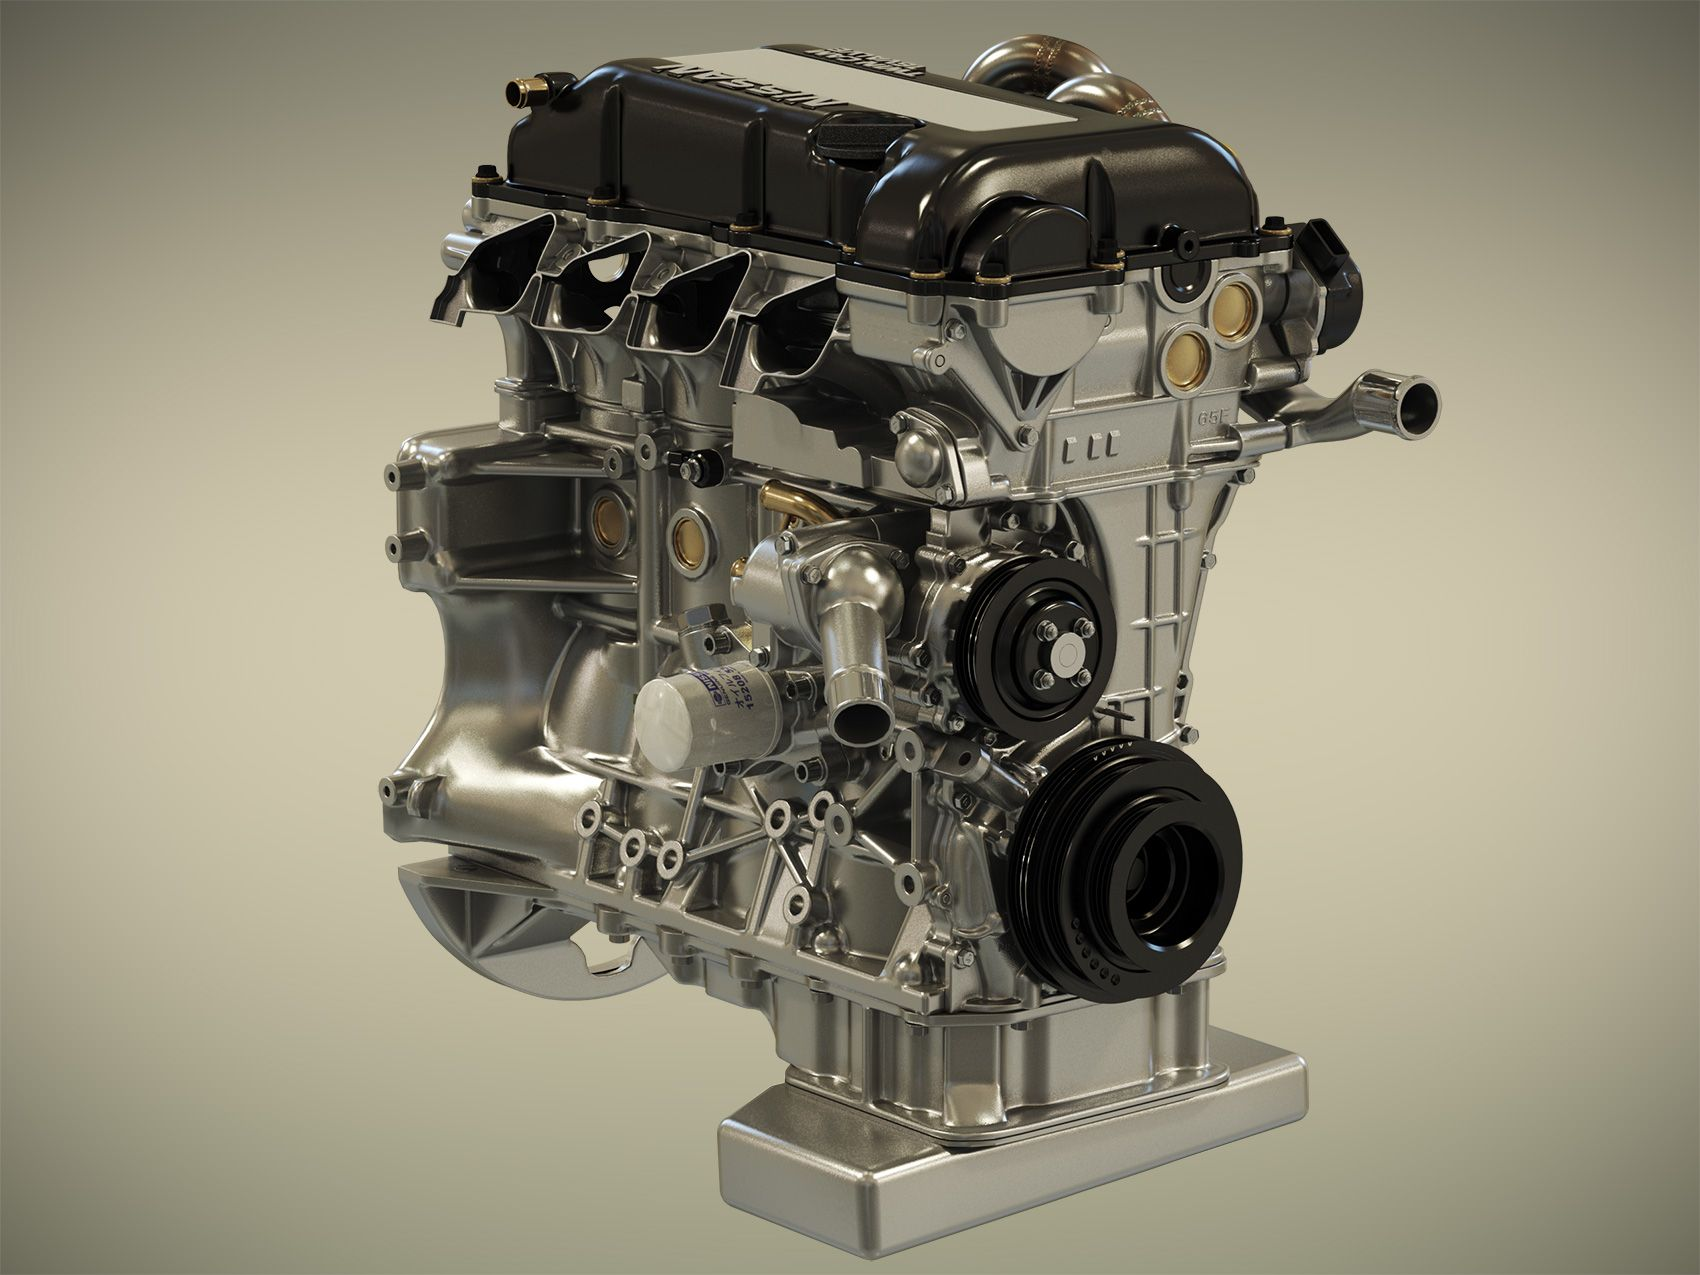 Nissan Sr20det Engine Page 2 Polycount Forum Automotive Engineering Nissan Motors Nissan